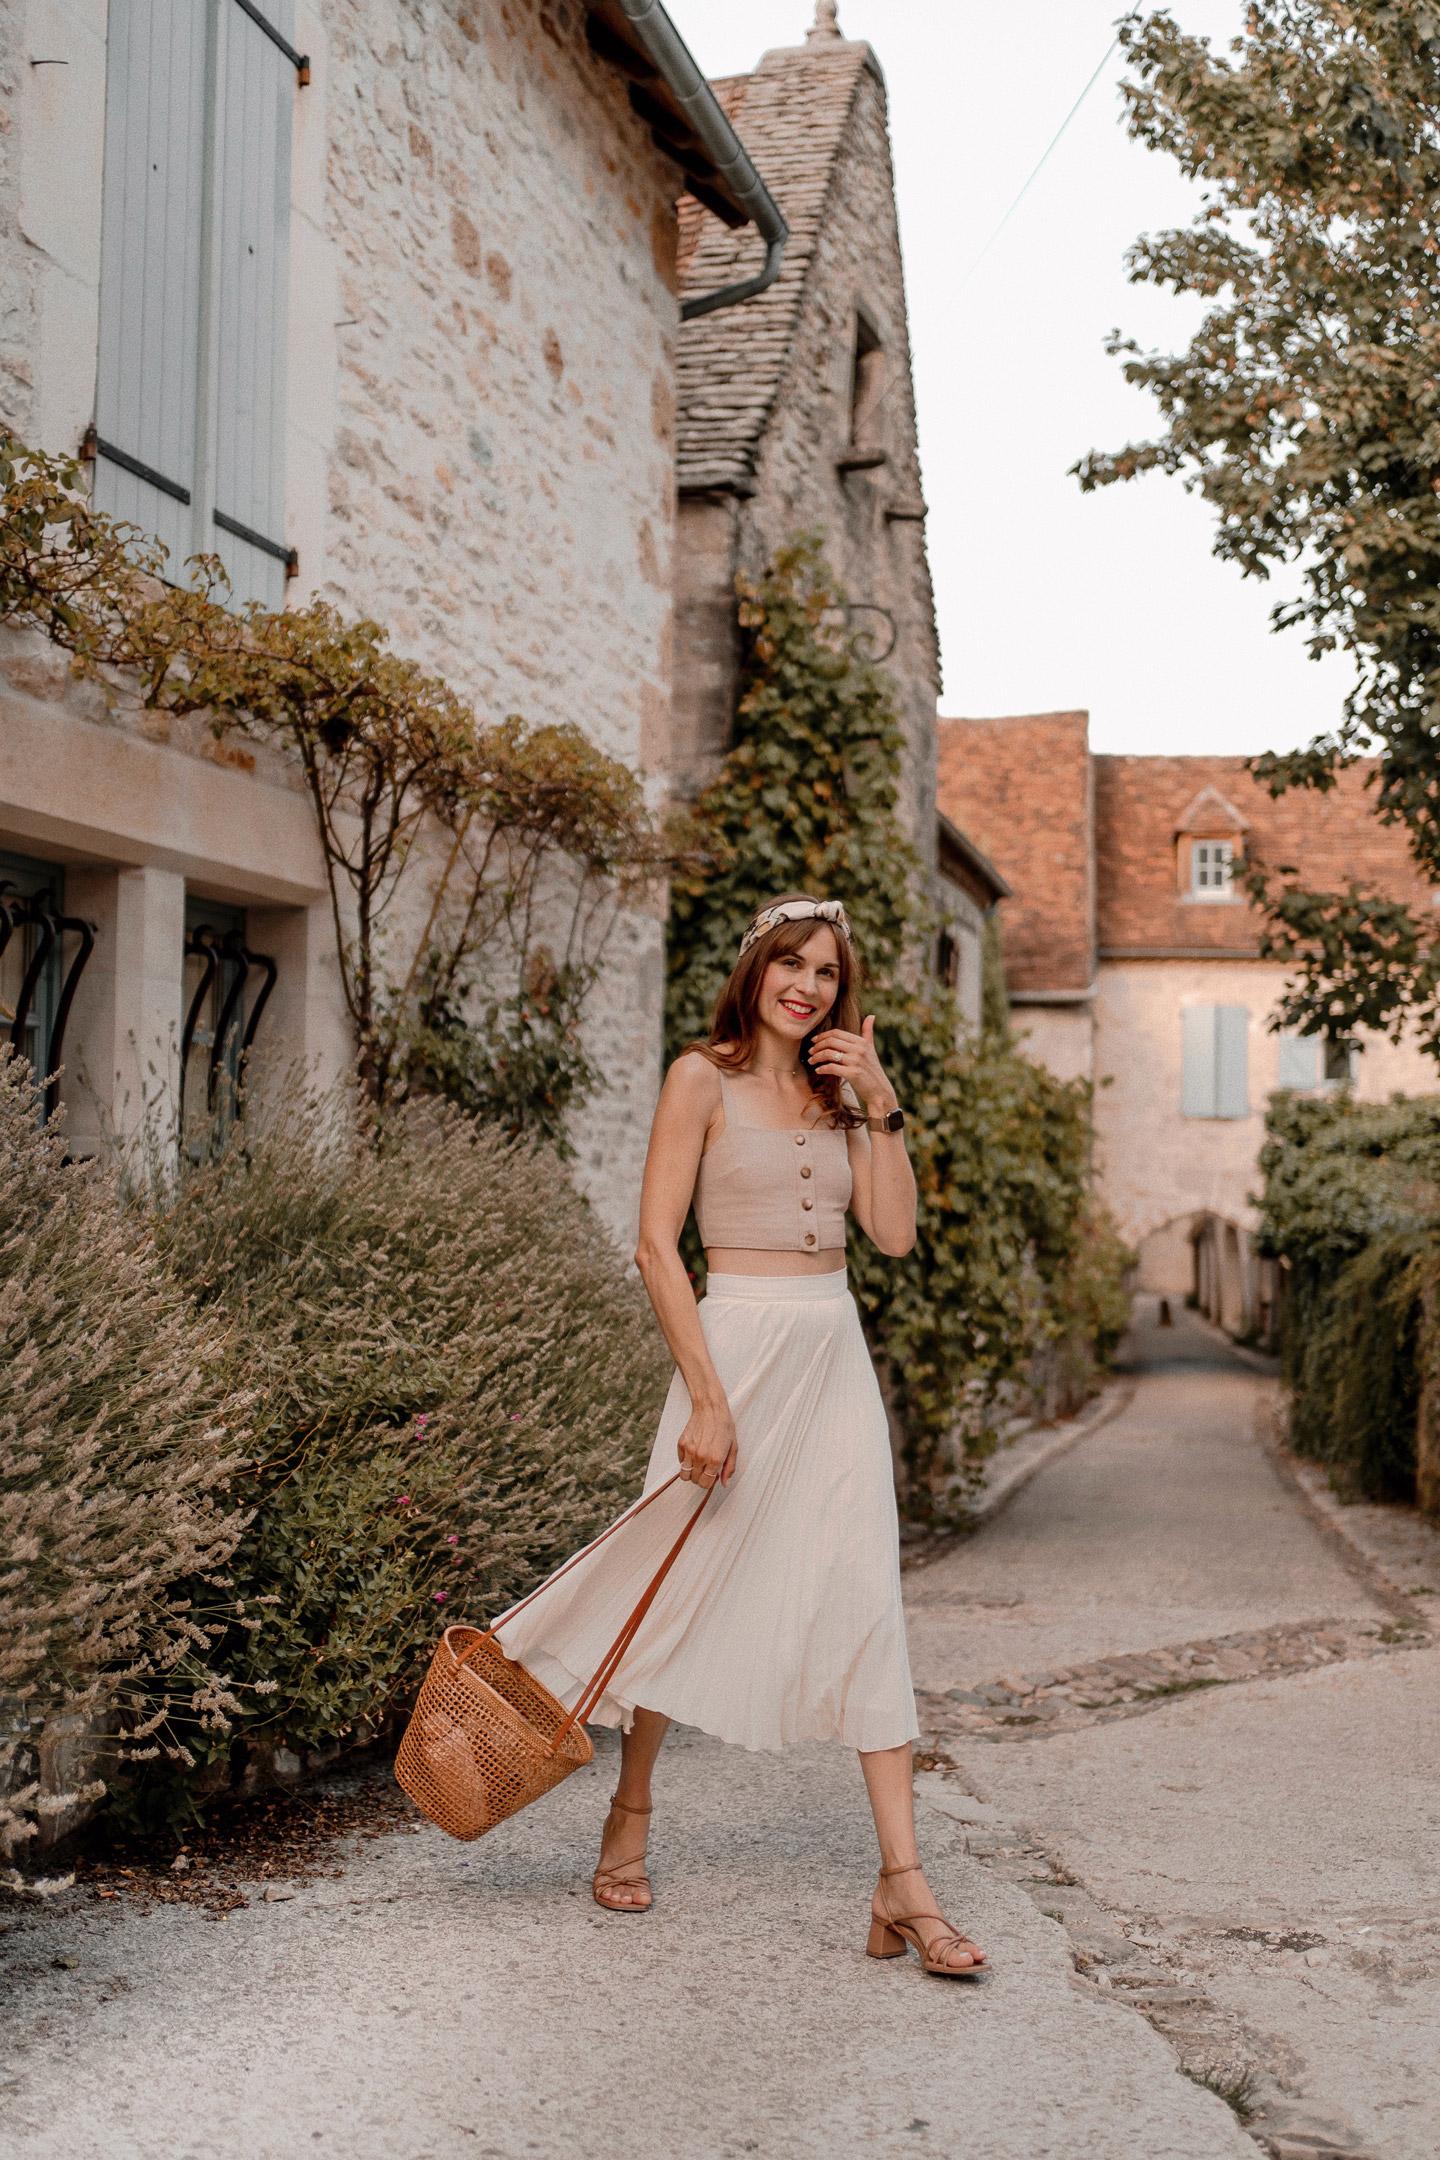 comment-porter-la-jupe-plissee5blog